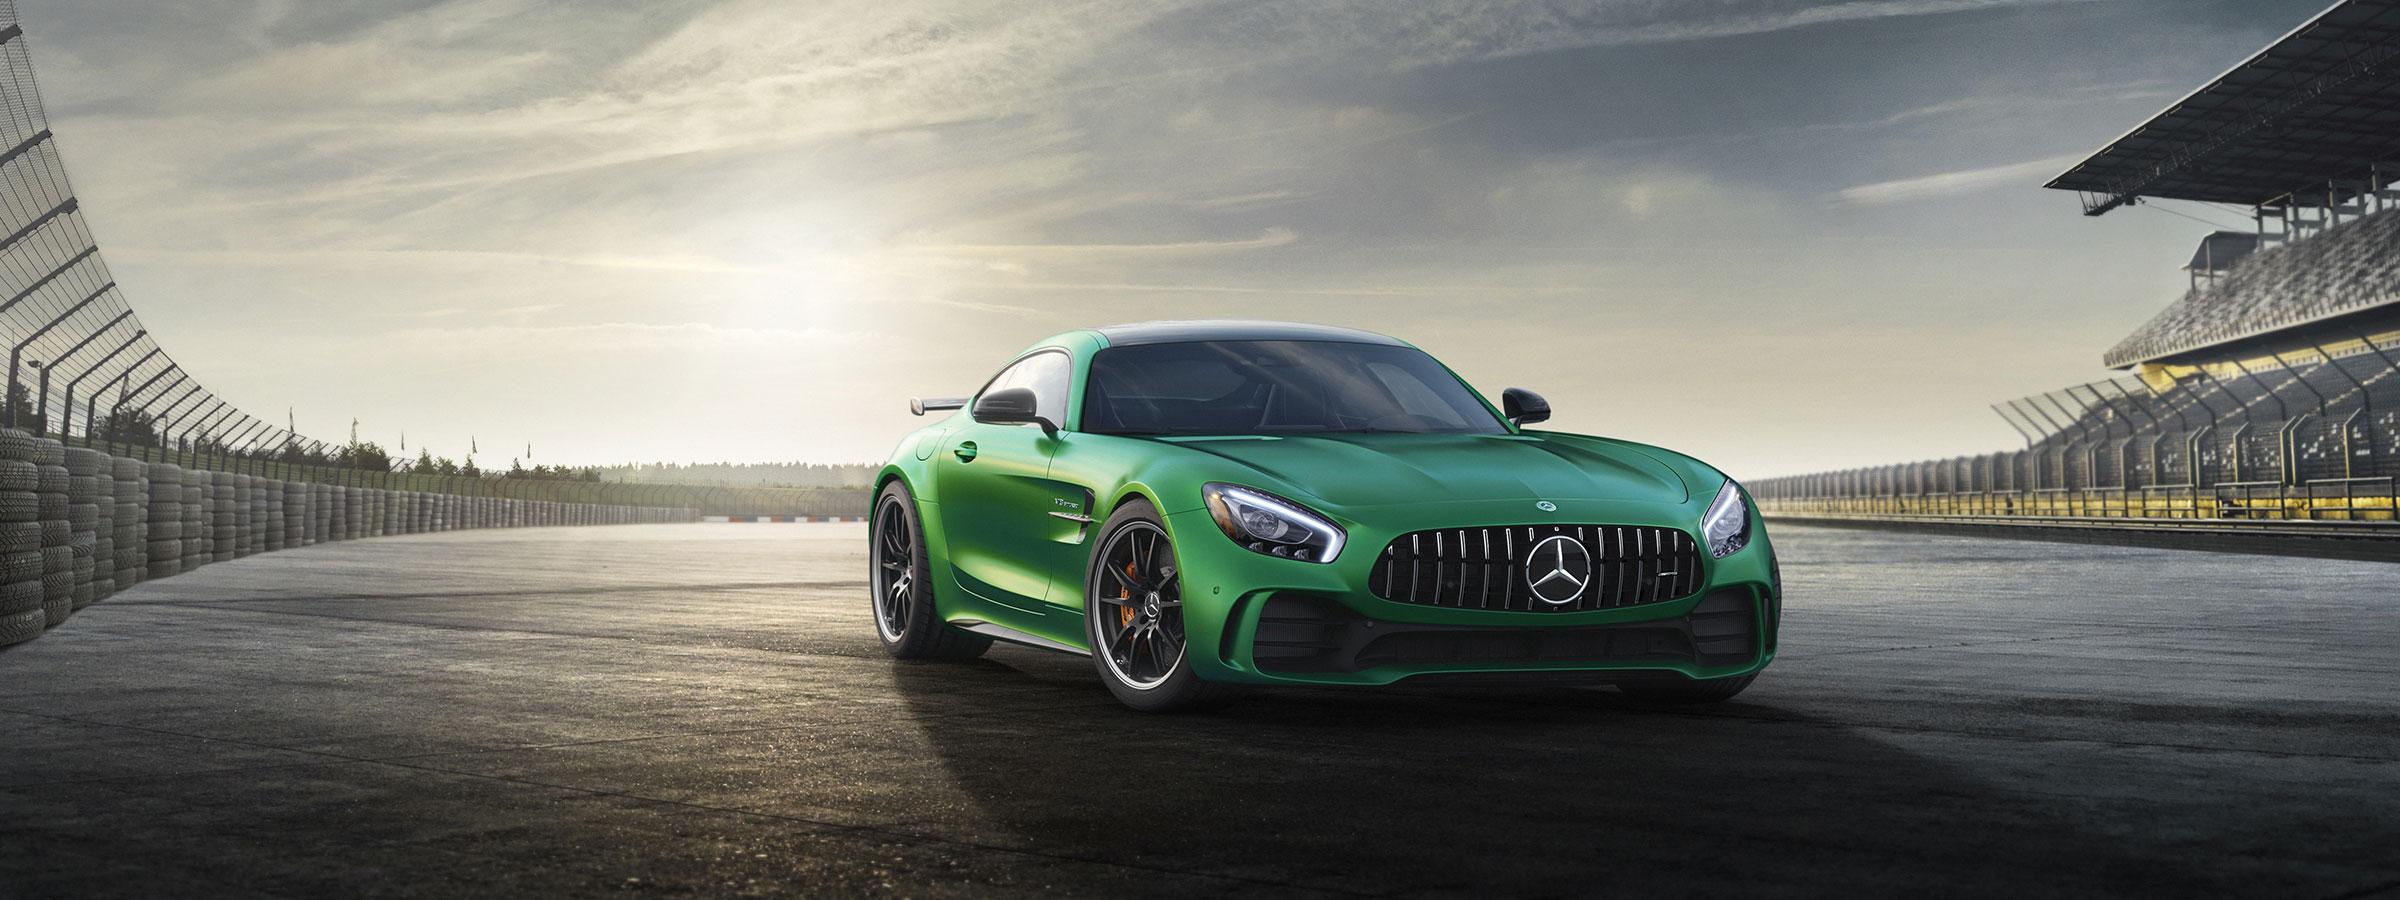 Mercedes Benz Amg >> Mercedes Benz Amg Ultimate Performance Mercedes Benz Of Littleton